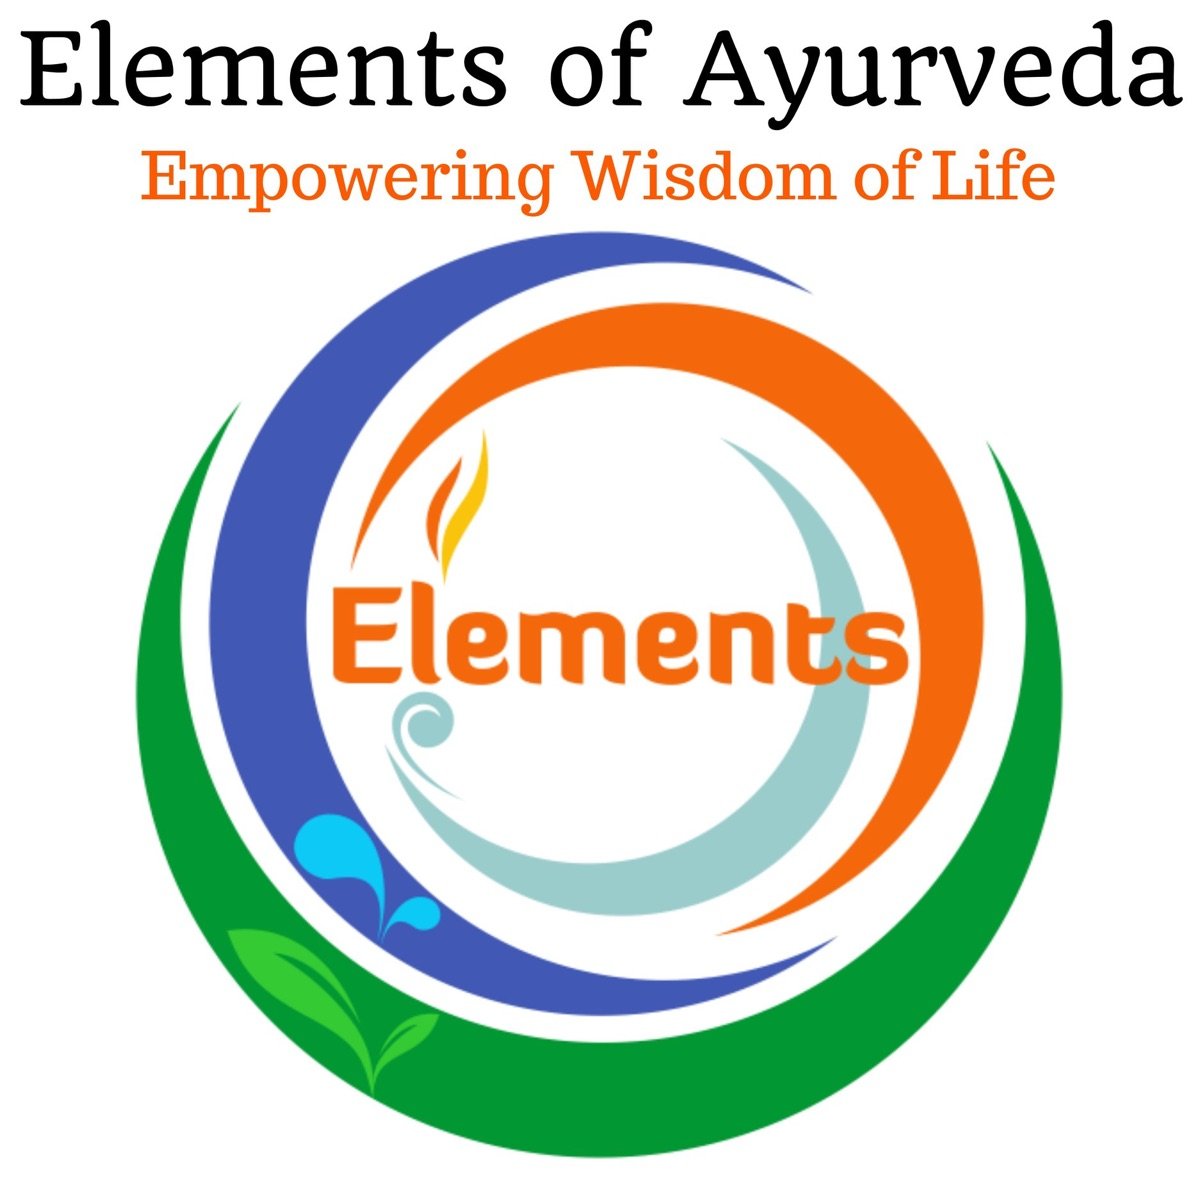 Elements of Ayurveda